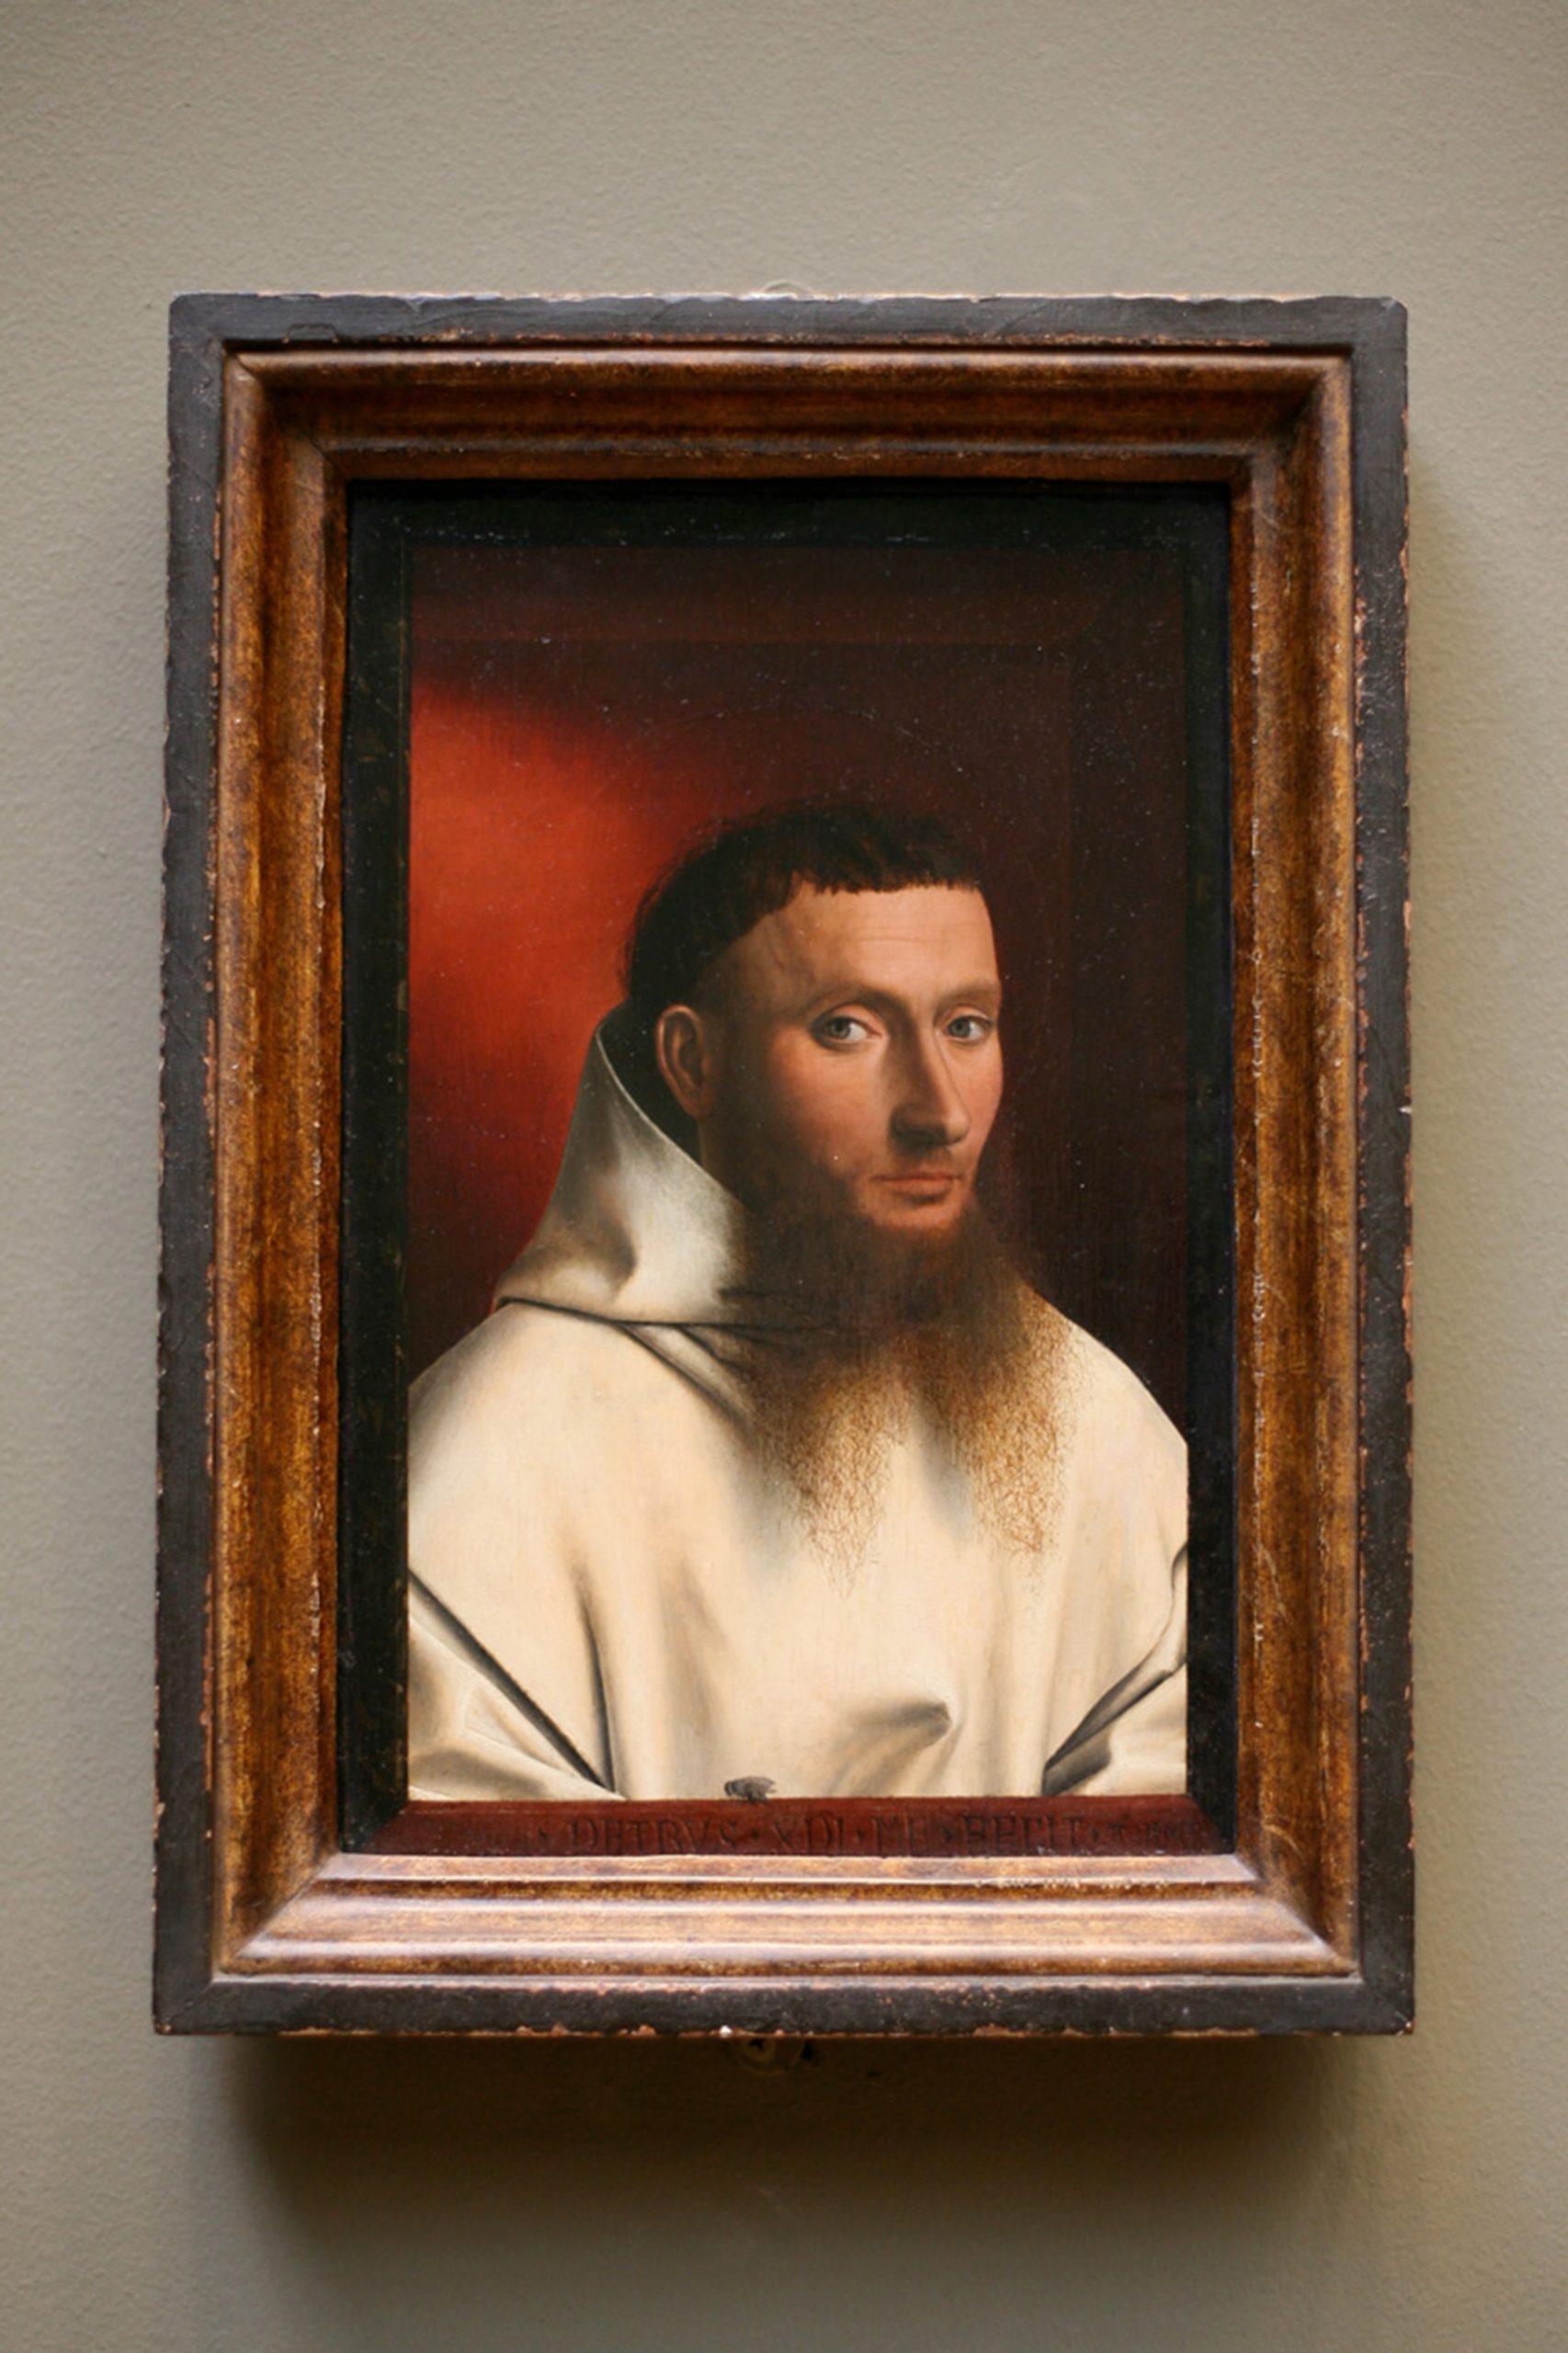 Petrus Christus, Portrait of a Carthusian, 1446, oil on oak, Metropolitan Museum of Art, New York.